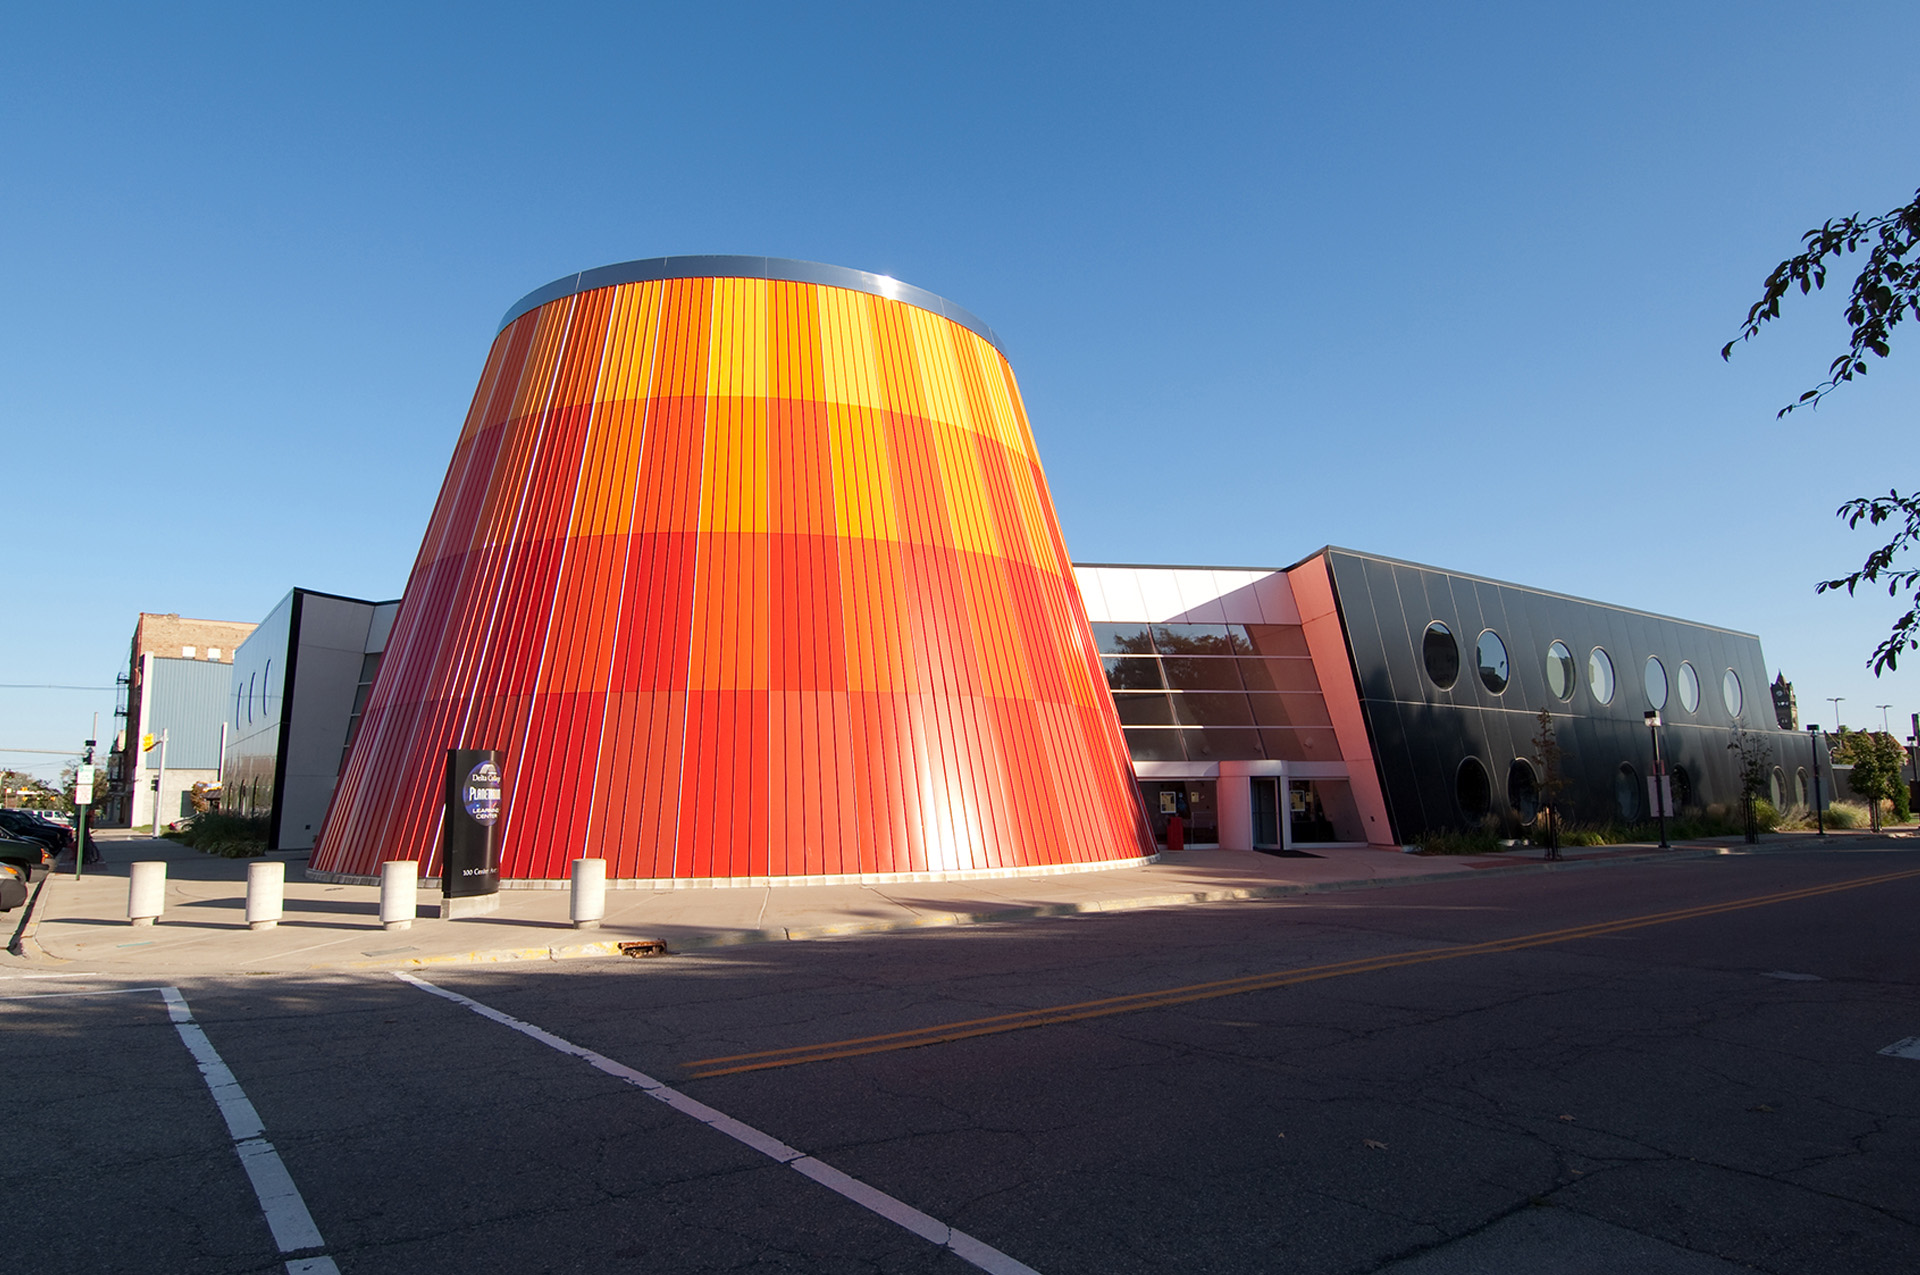 Exterior of the Delta College Planetarium & Learning Center